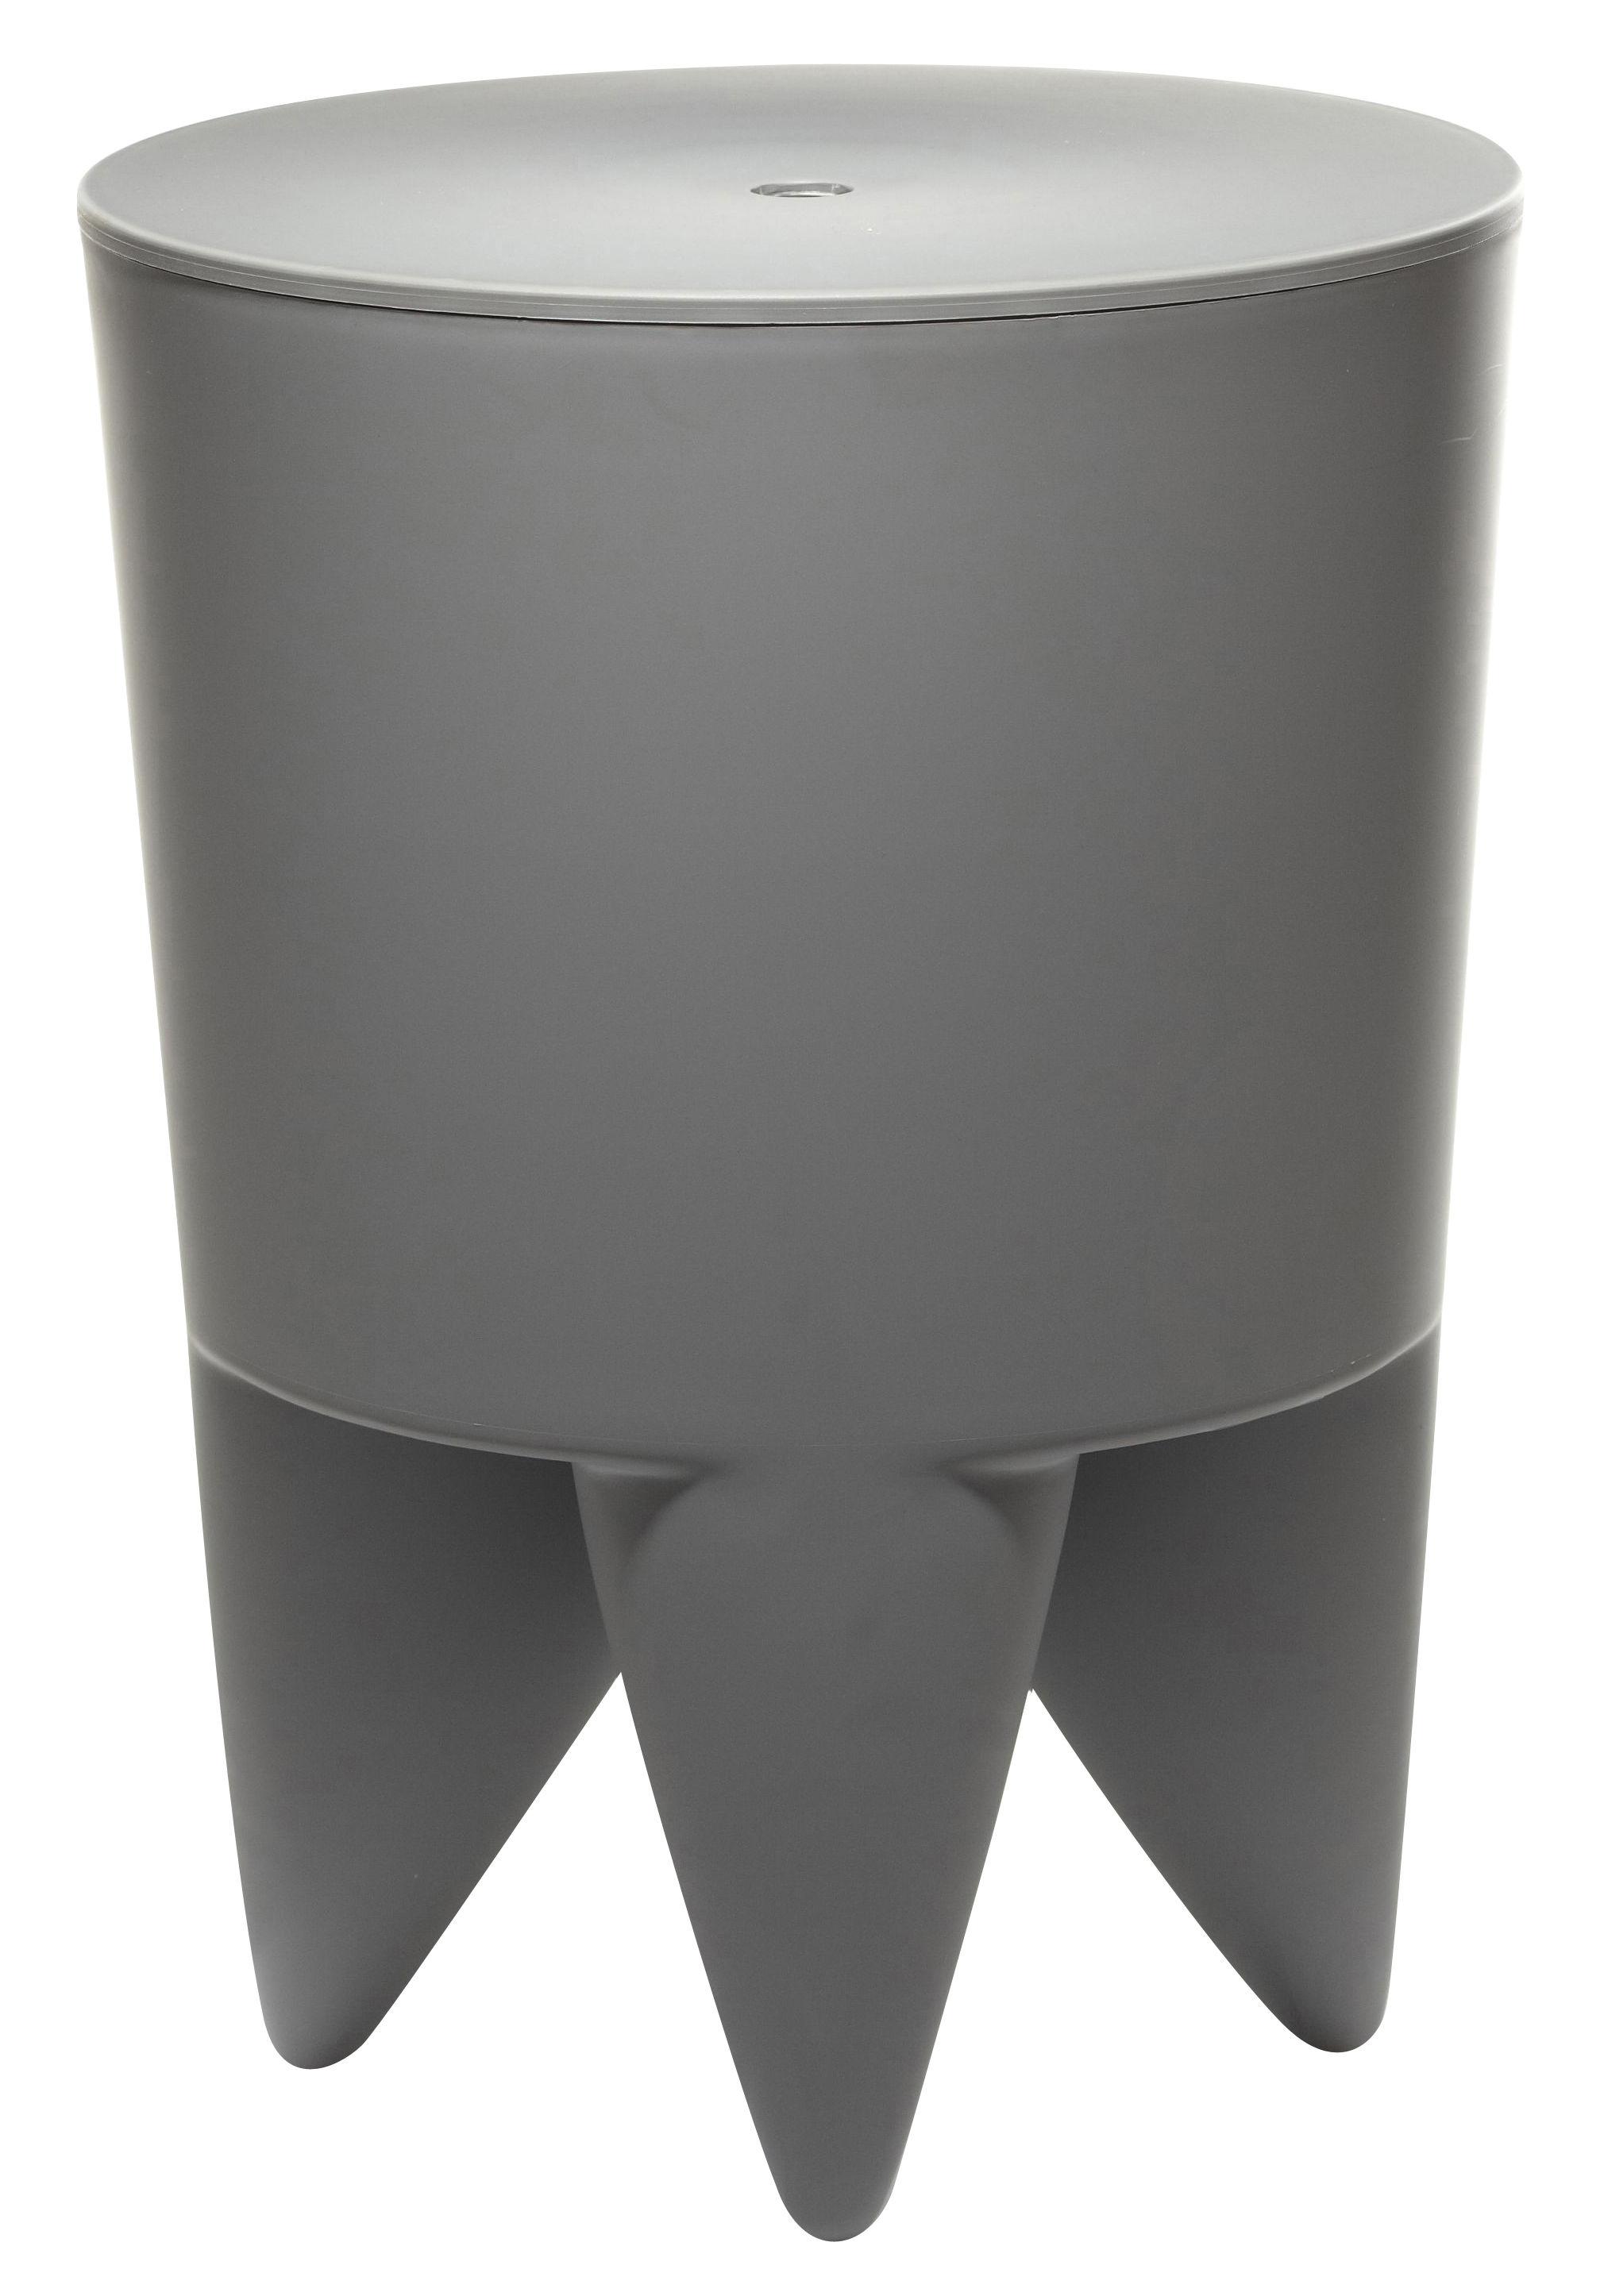 new bubu 1er stool soft grey by xo. Black Bedroom Furniture Sets. Home Design Ideas